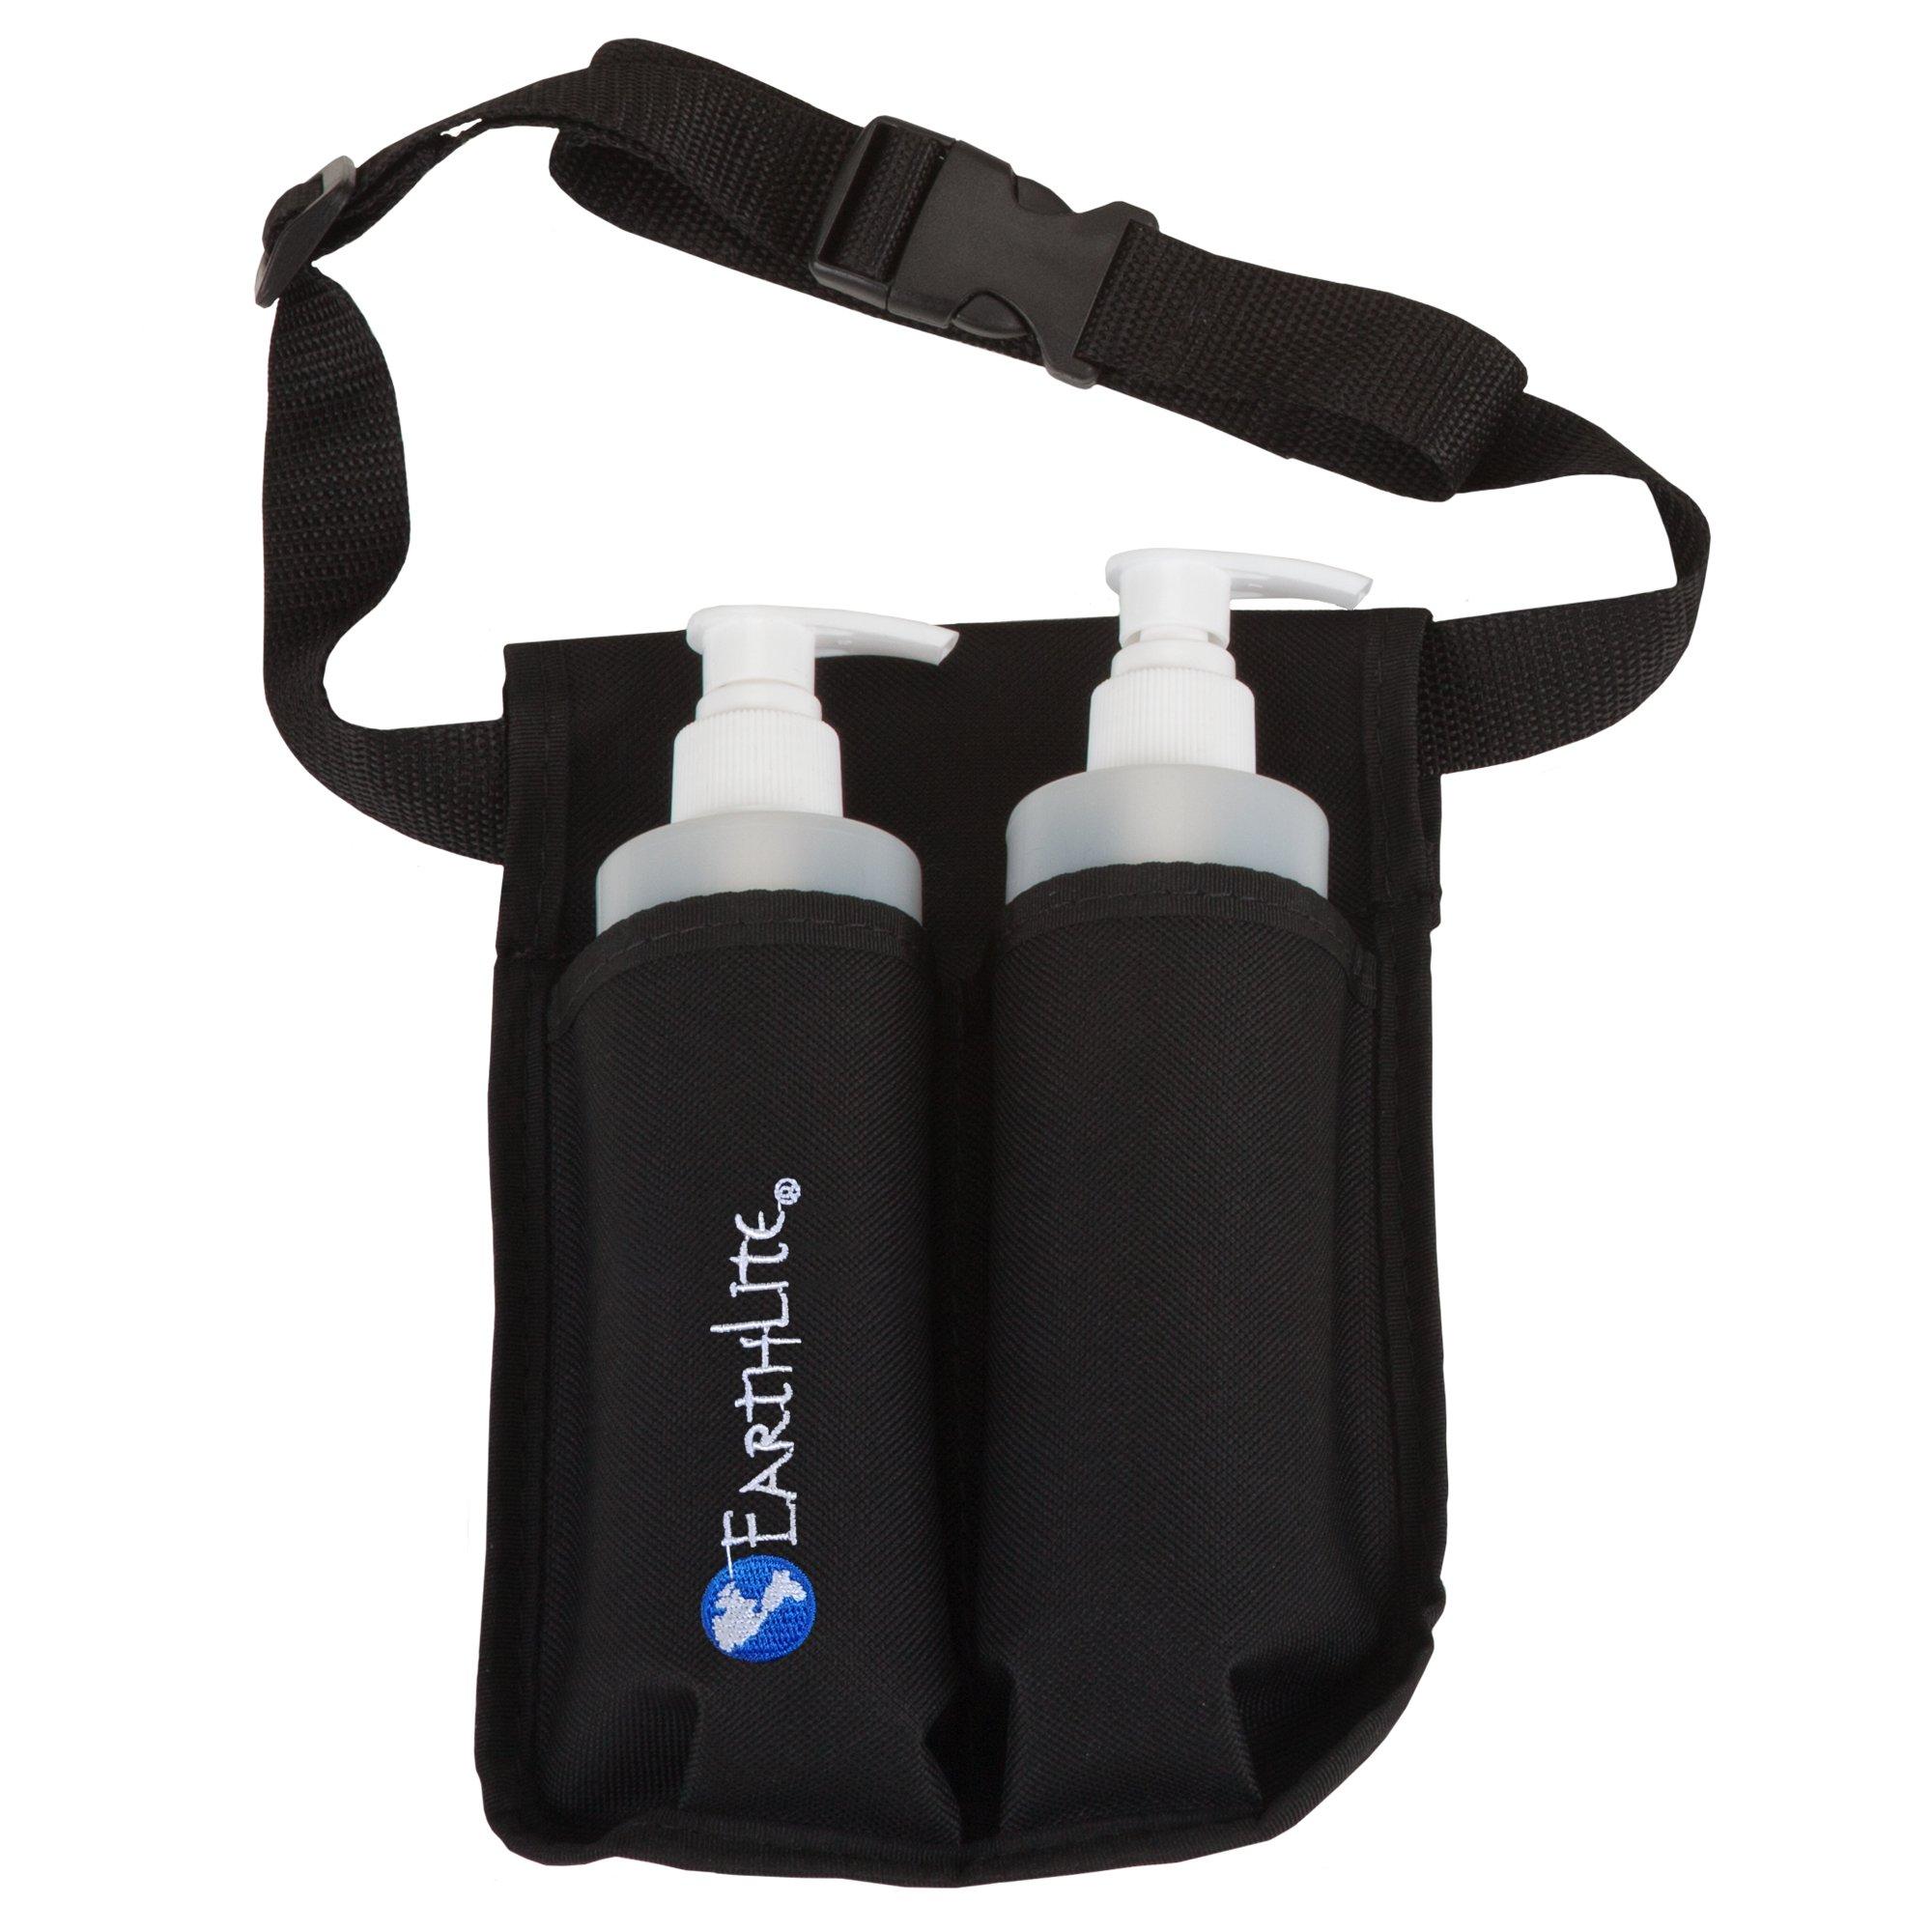 EARTHLITE Massage Bottle Holster Double Kit - Incl. 2 Bottles & Heavy Duty, Adjustable Double Holster for Massage Oil, Massage Lotion (2x 8oz)